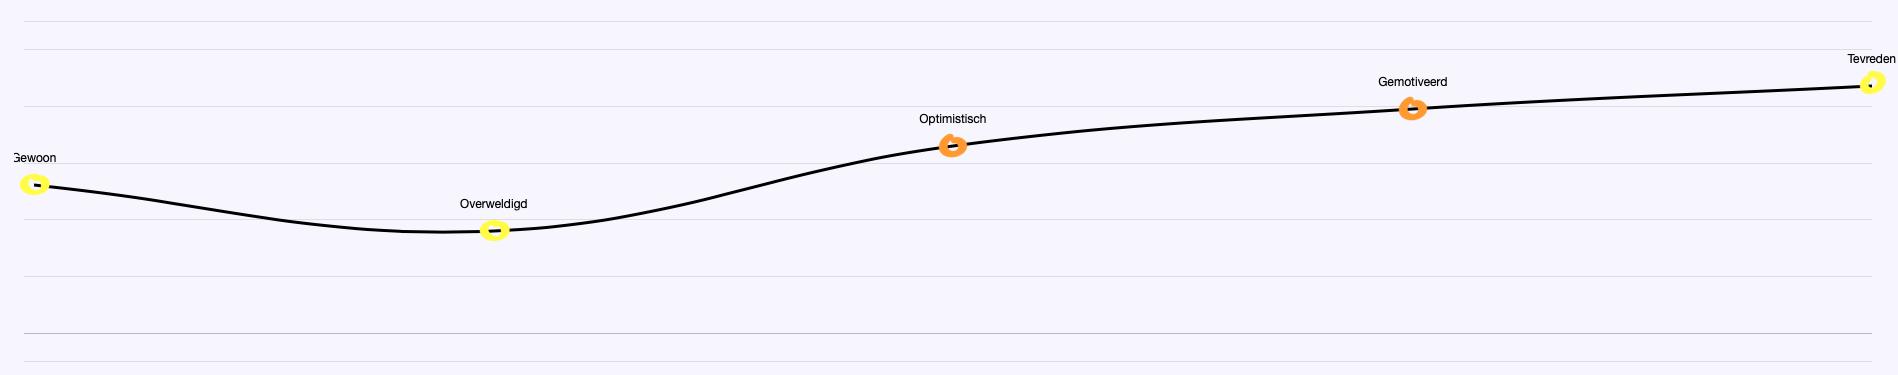 Customer Journey Curve